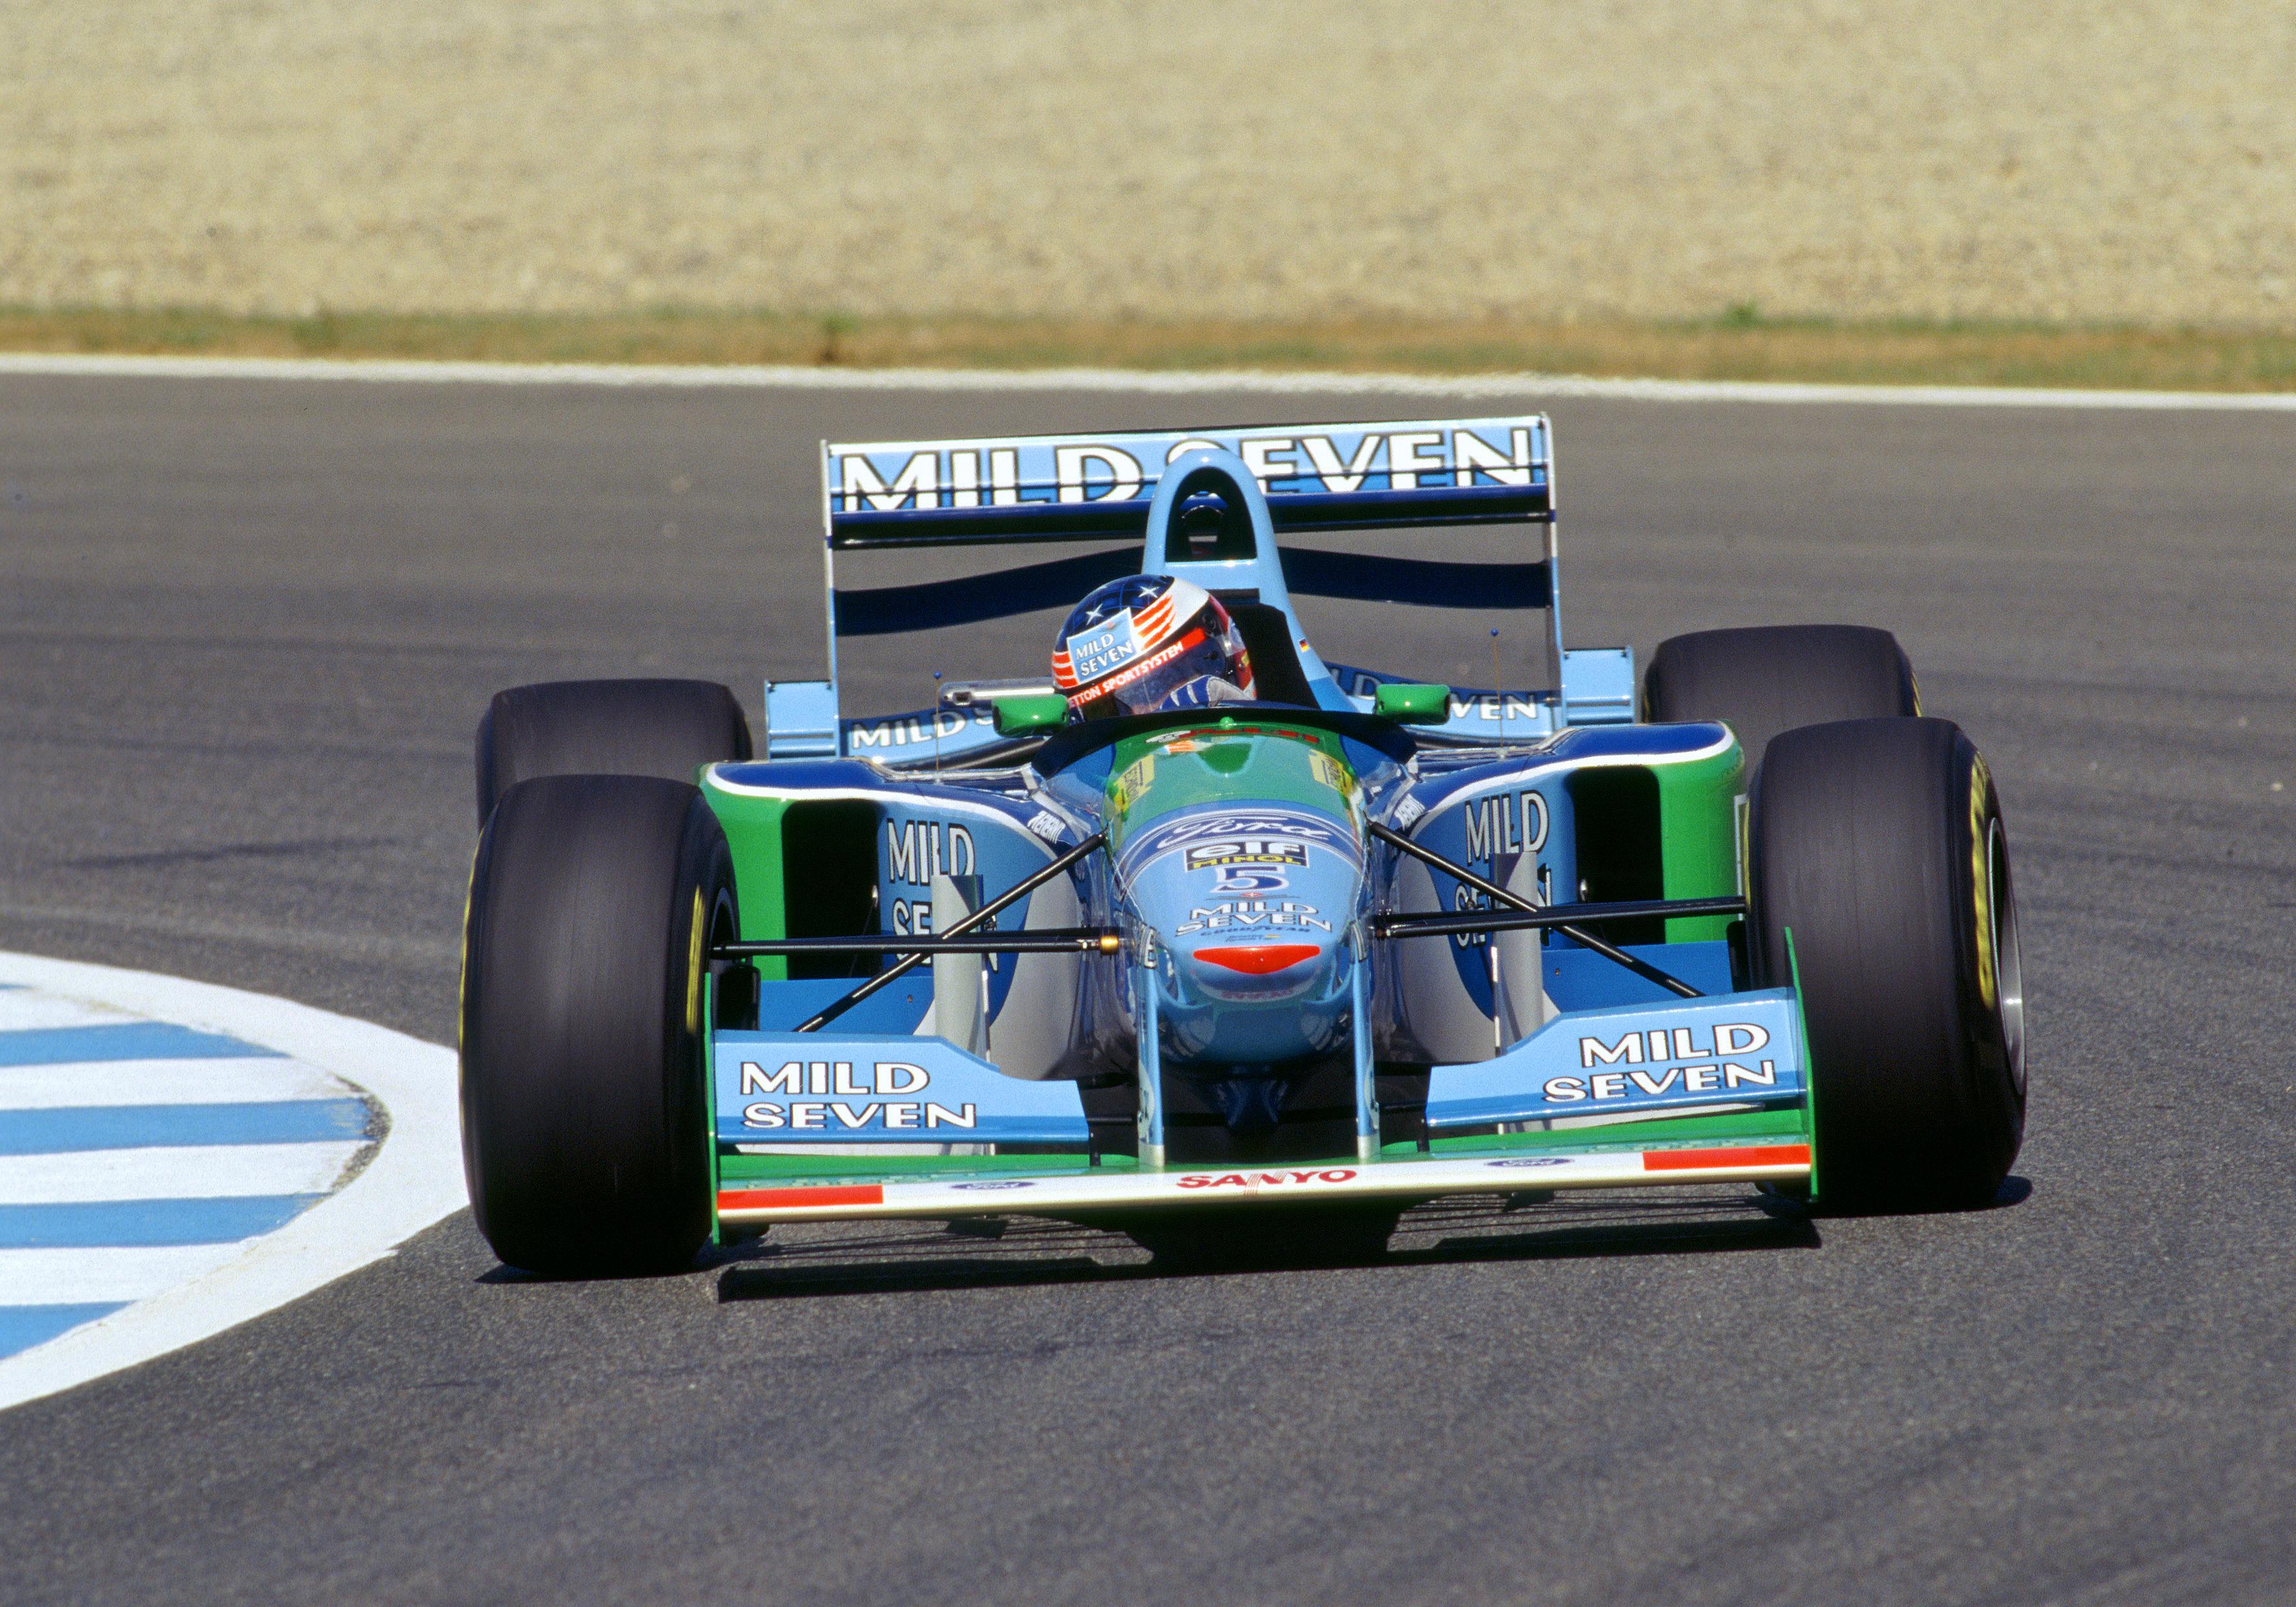 Michael Schumacher Benetton F1 1994